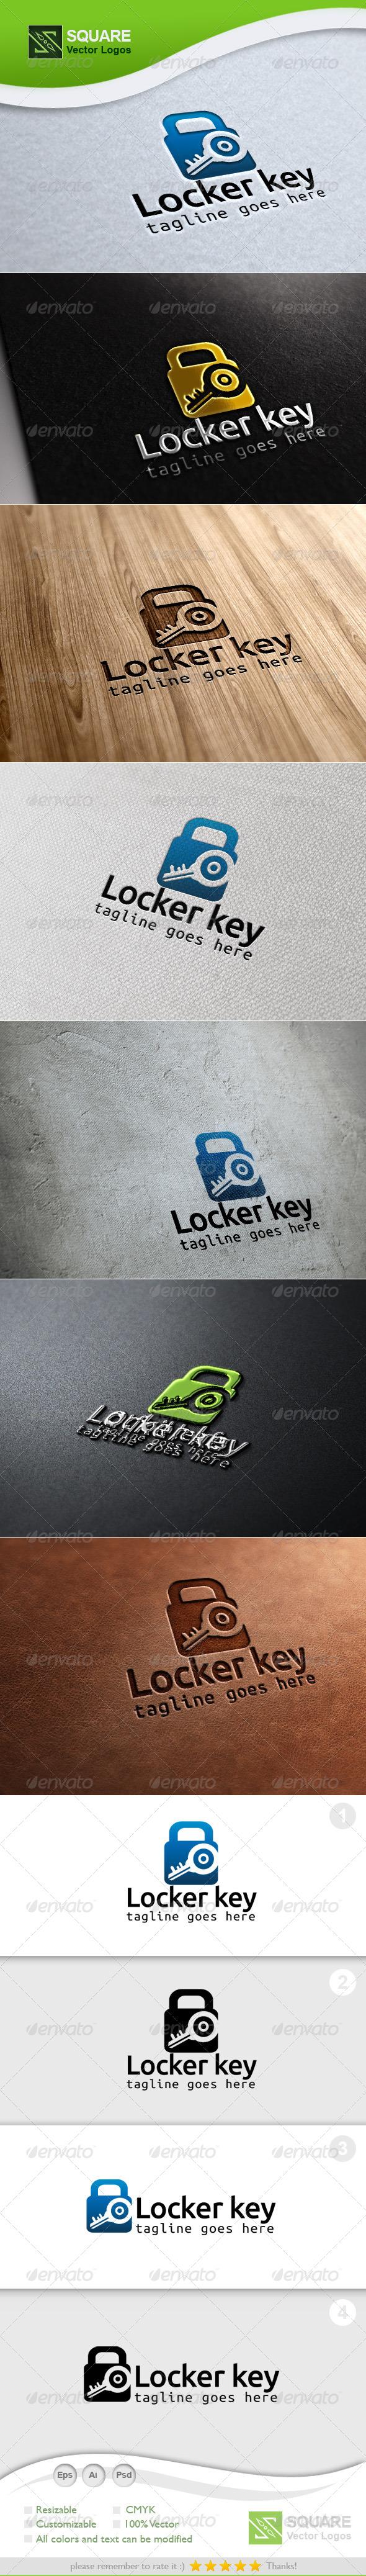 GraphicRiver Locker Key Vector Logo Template 6735748